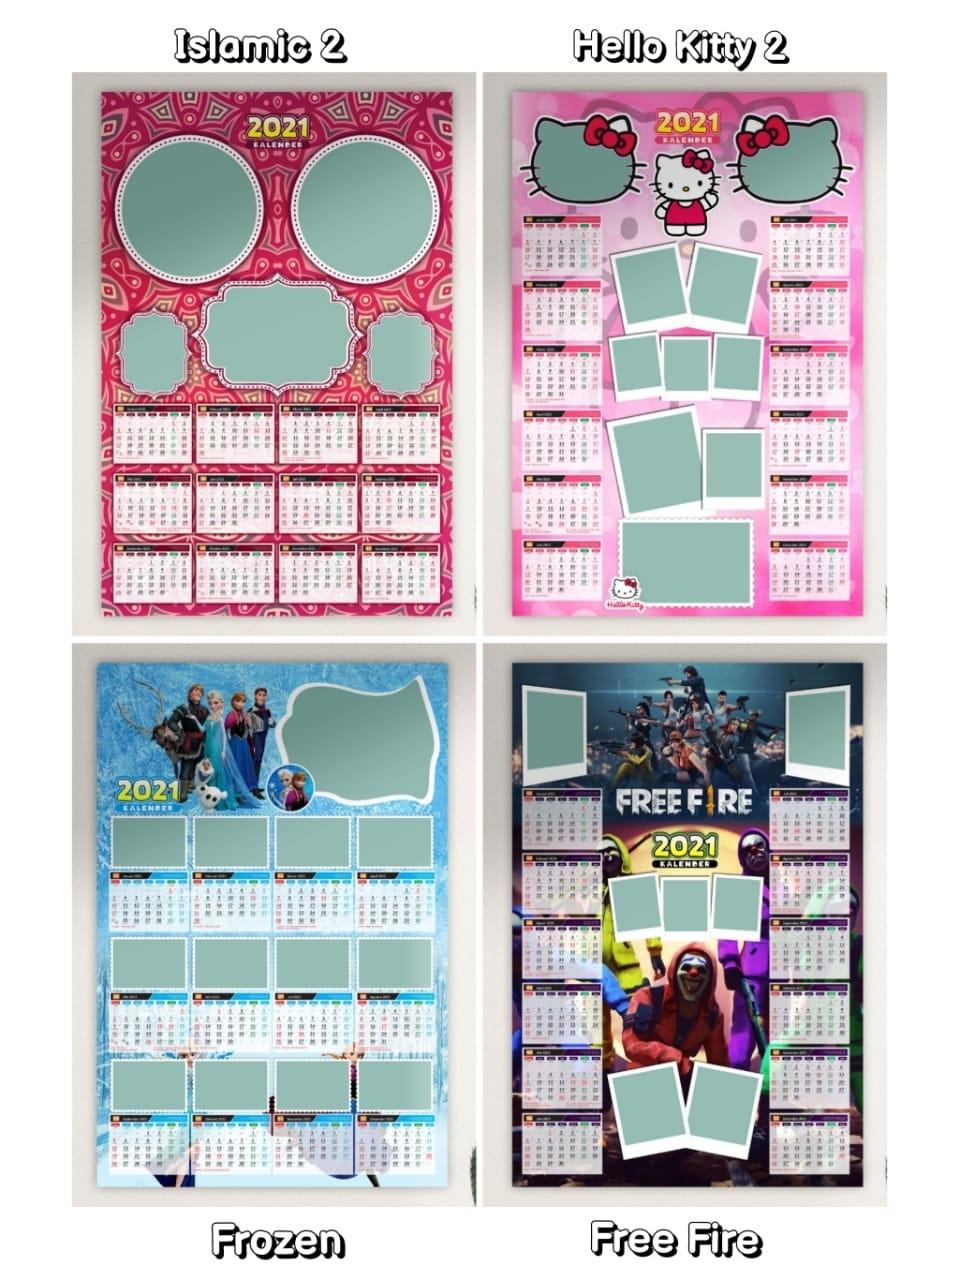 Template Kalender 2021 Hello Kitty - Celoteh Bijak